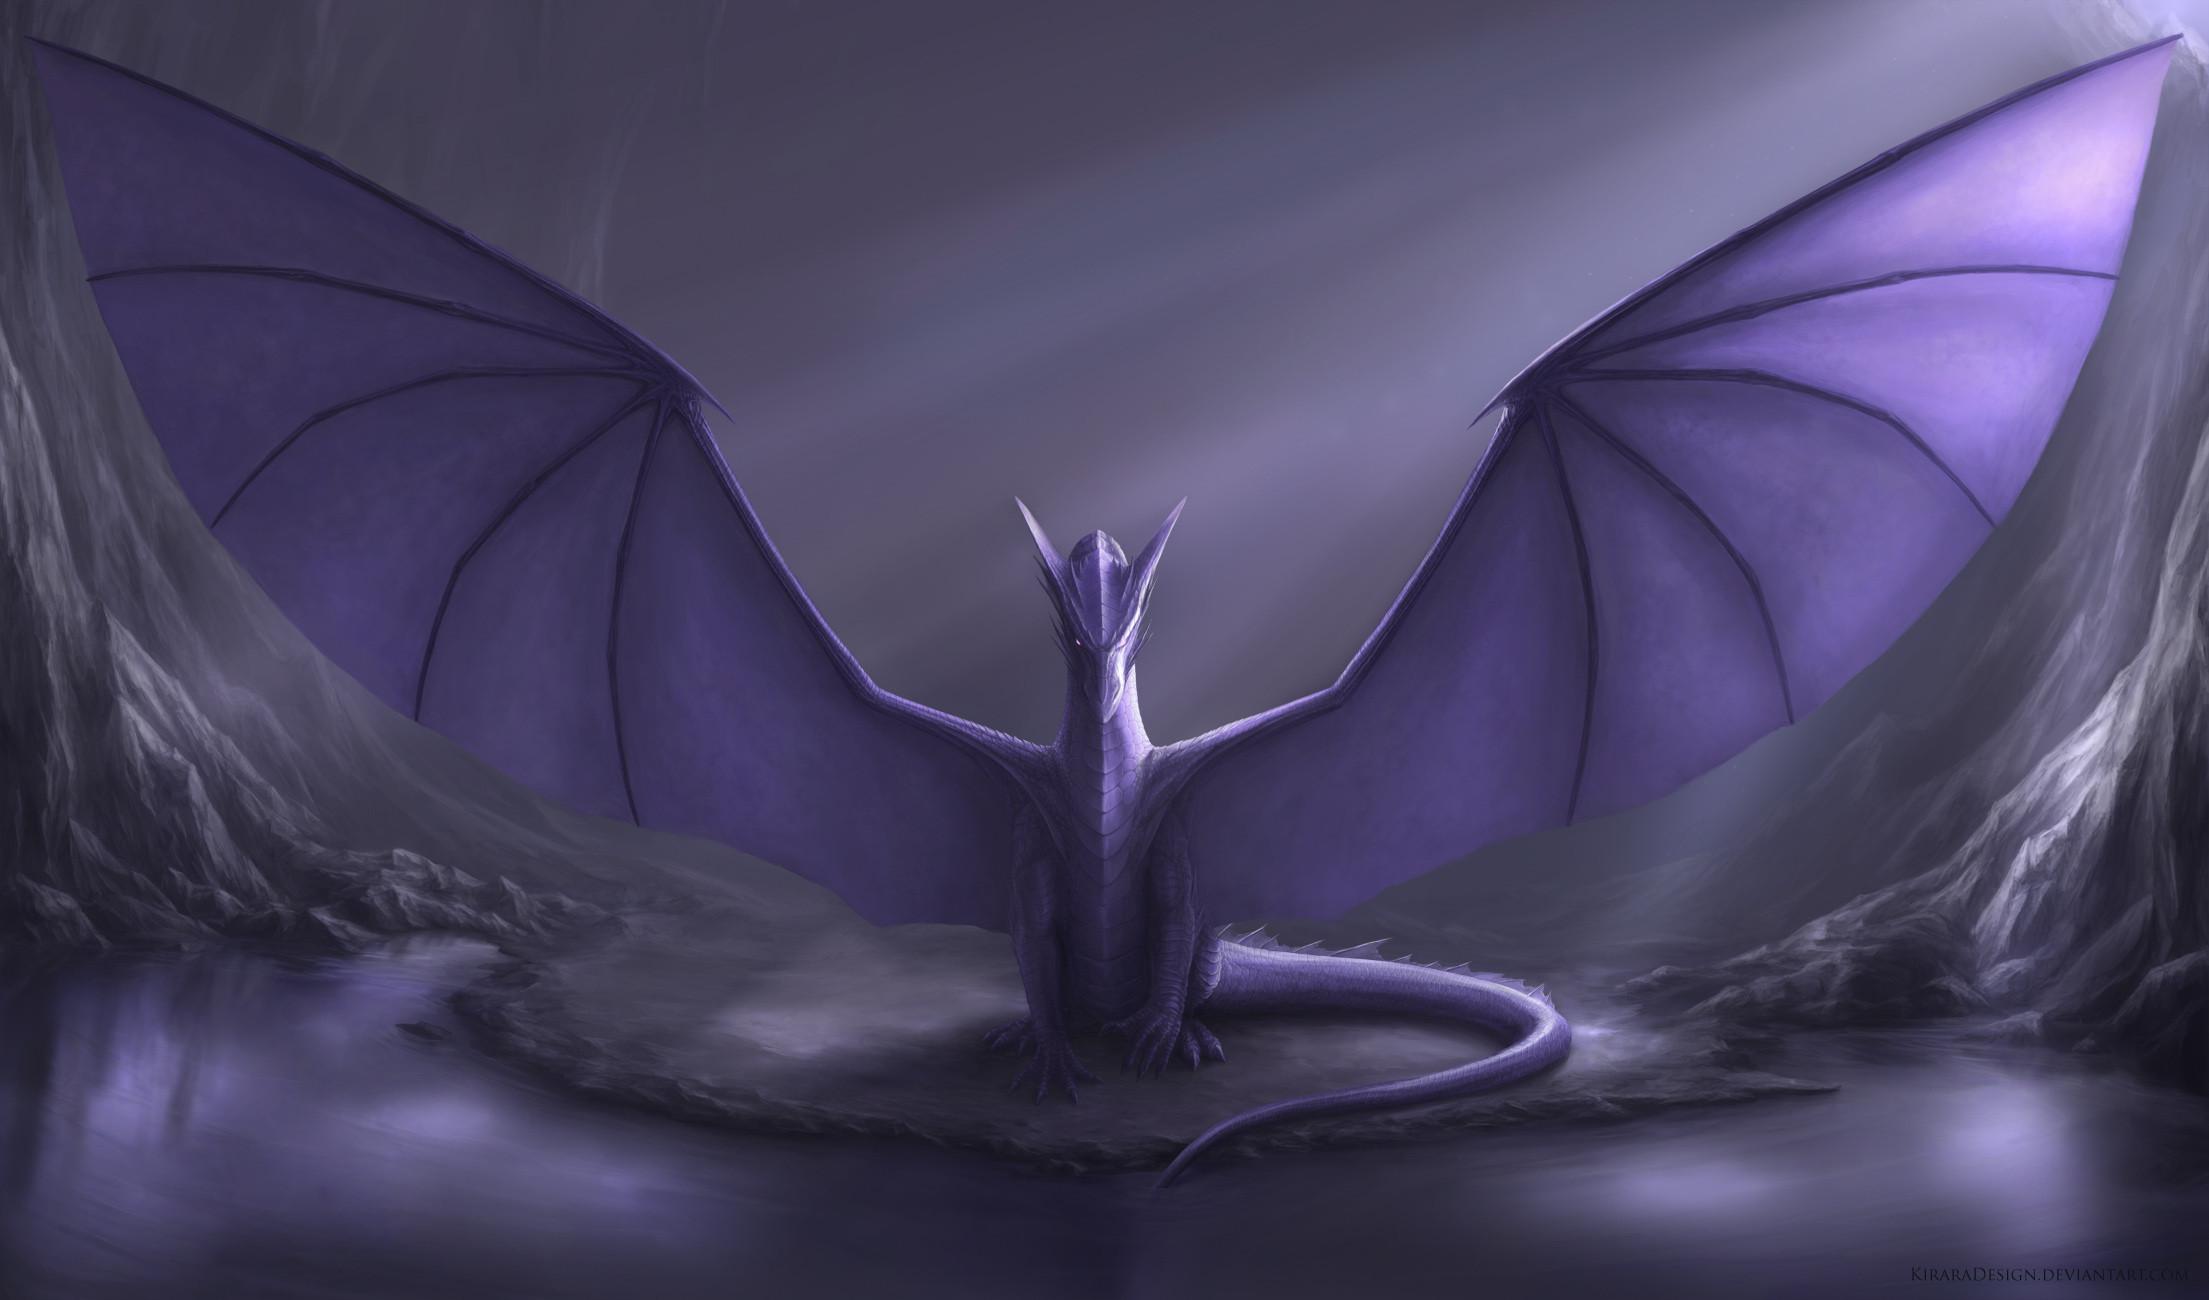 Wallpapers For > Purple Dragon Wallpaper 1920×1080